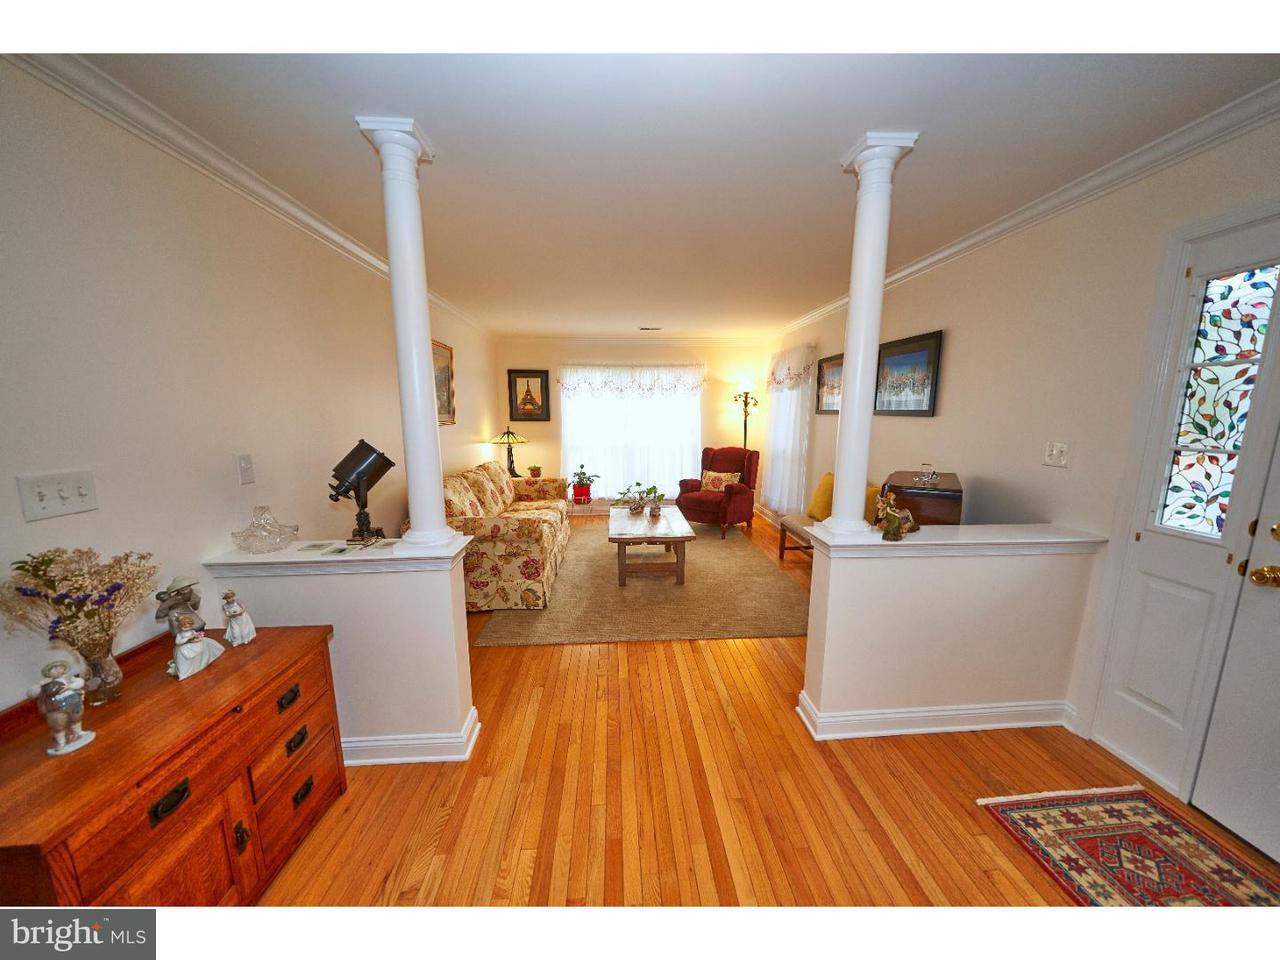 Townhouse for Rent at 605 CRESTSTONE Circle South Brunswick, New Jersey 08540 United StatesMunicipality: South Brunswick Township